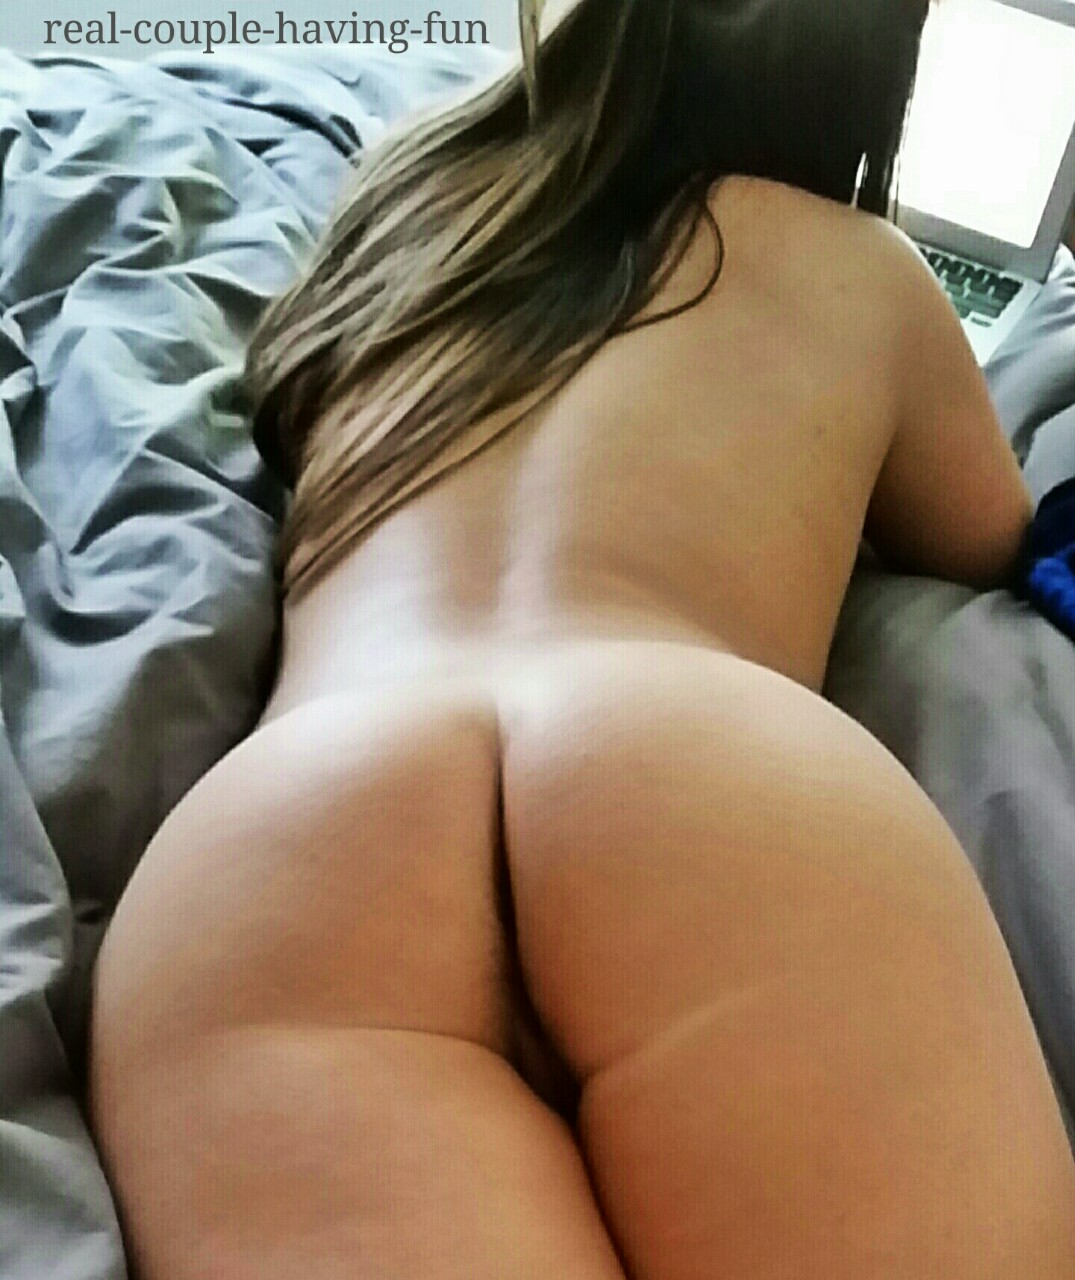 selfie hot sexy du 41 de jolie fille